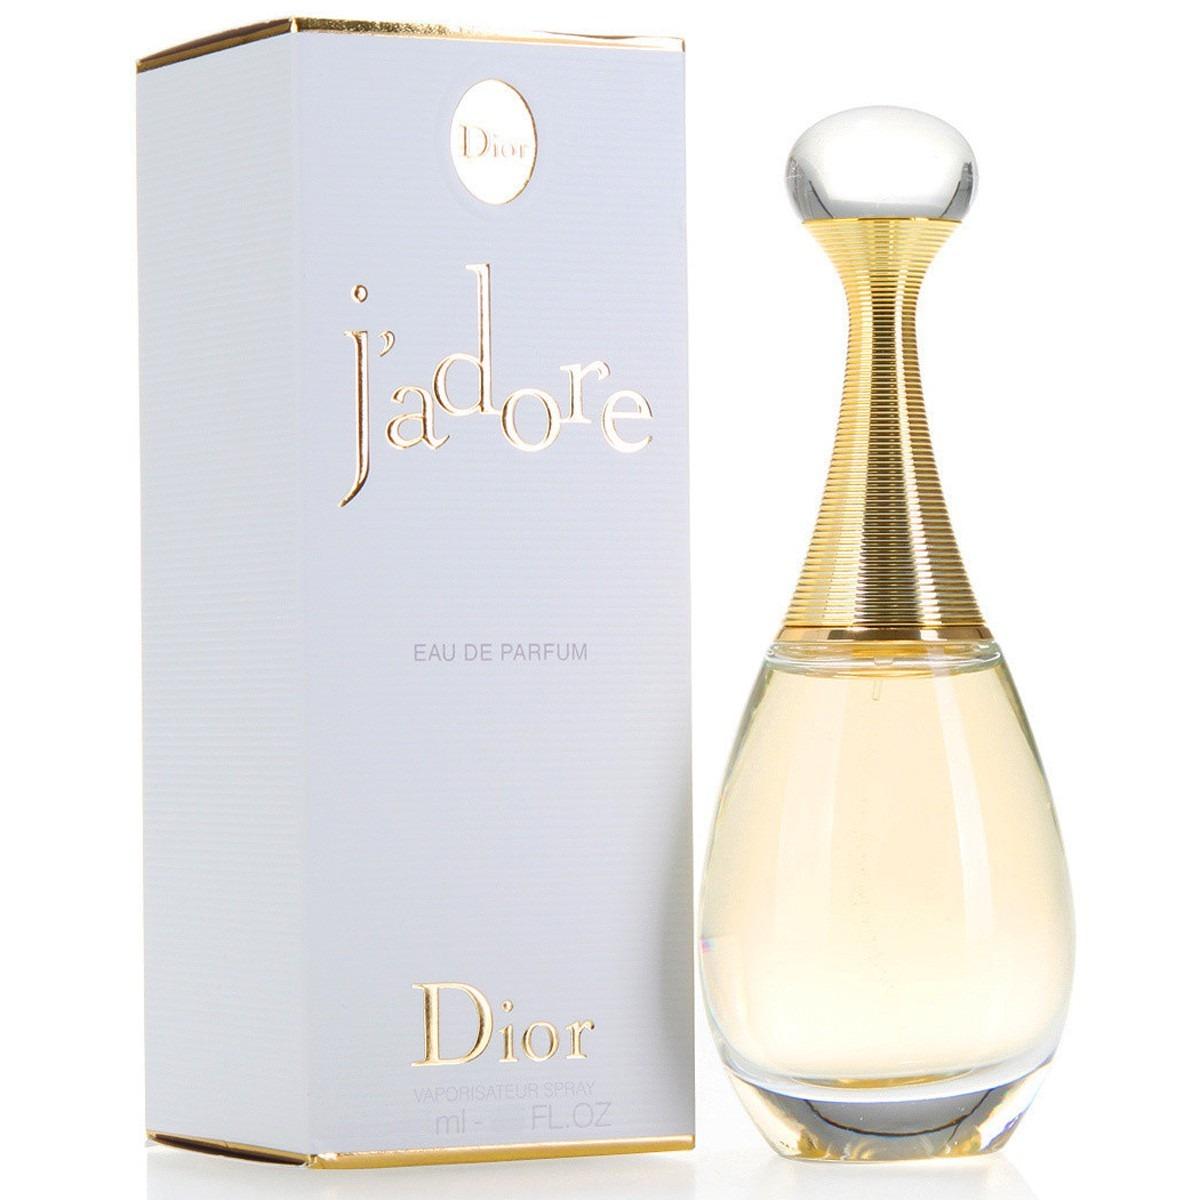 Perfume Importado J'adore Edp 100ml - Christian Dior Feminino